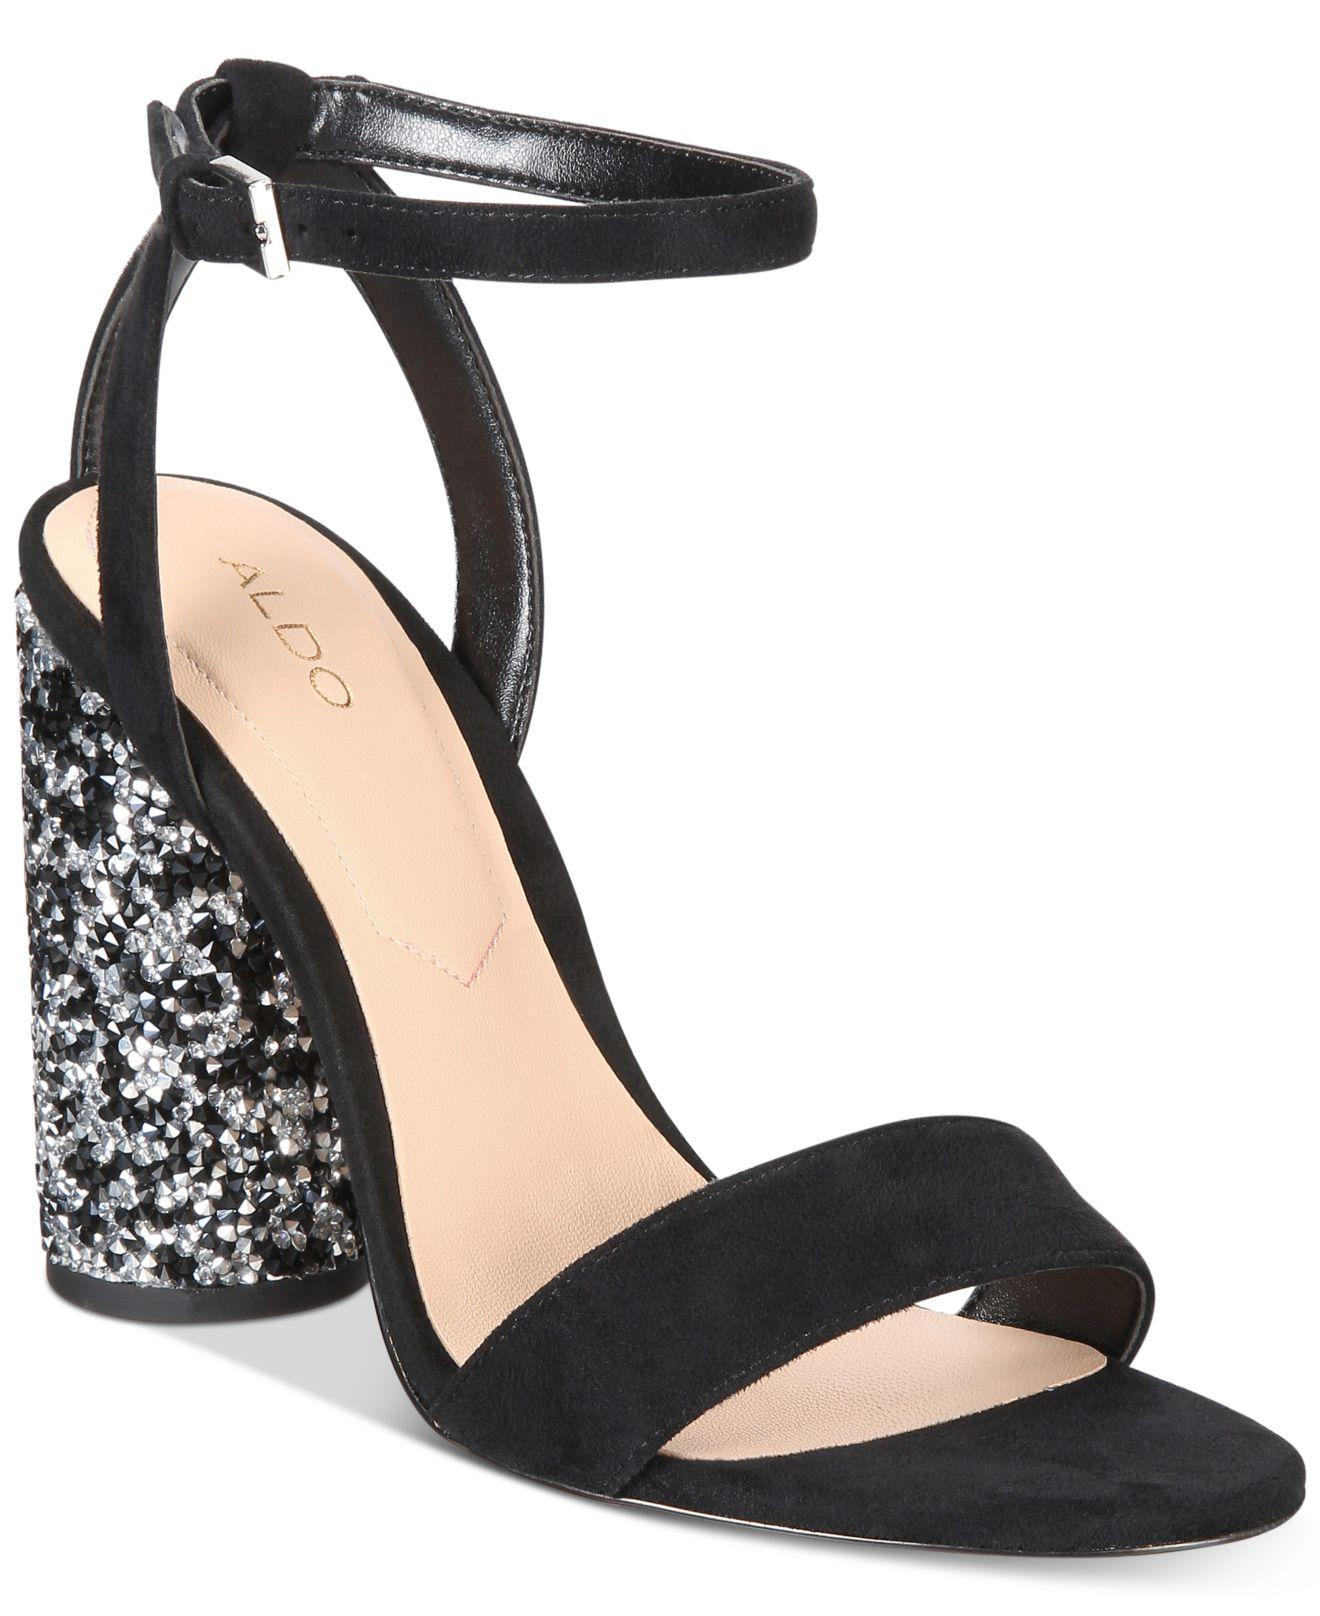 d240b5e8f18 Lyst - ALDO Rossena Cylinder-heel Dress Sandals in Black